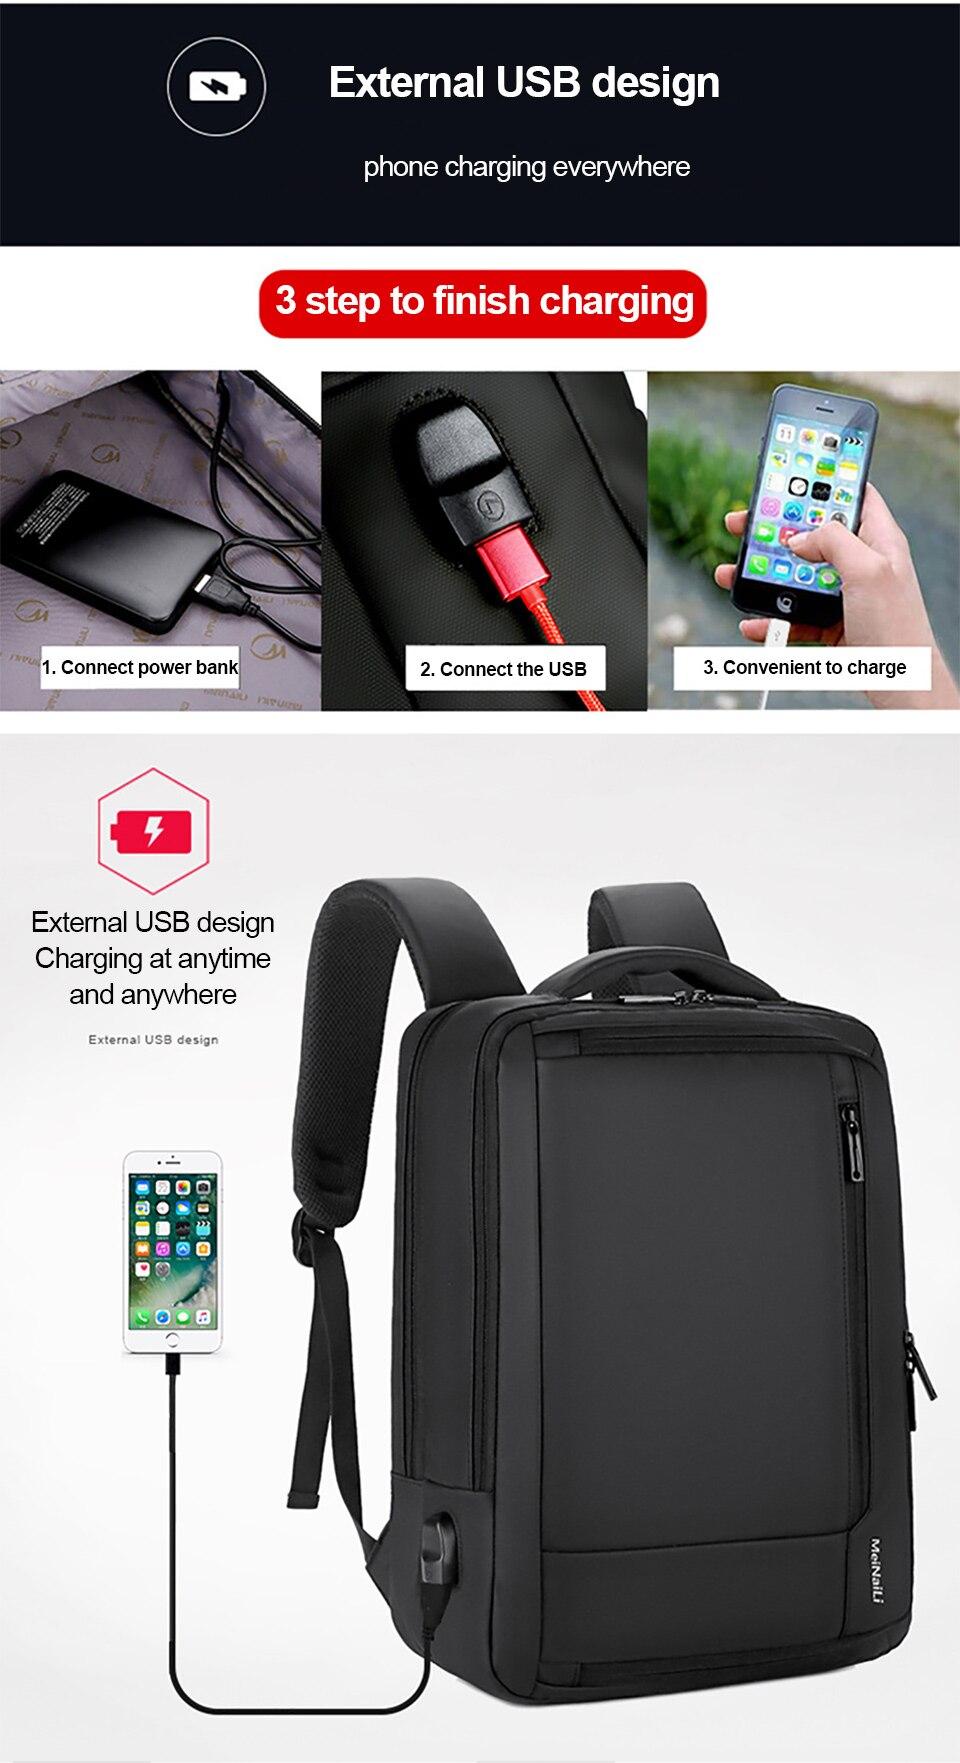 6 Multifunction USB Backpack Man Bag 15.6inch Laptop Backpacks Travel Bags Large Capacity Luggage Backpacking Waterproof Notebook